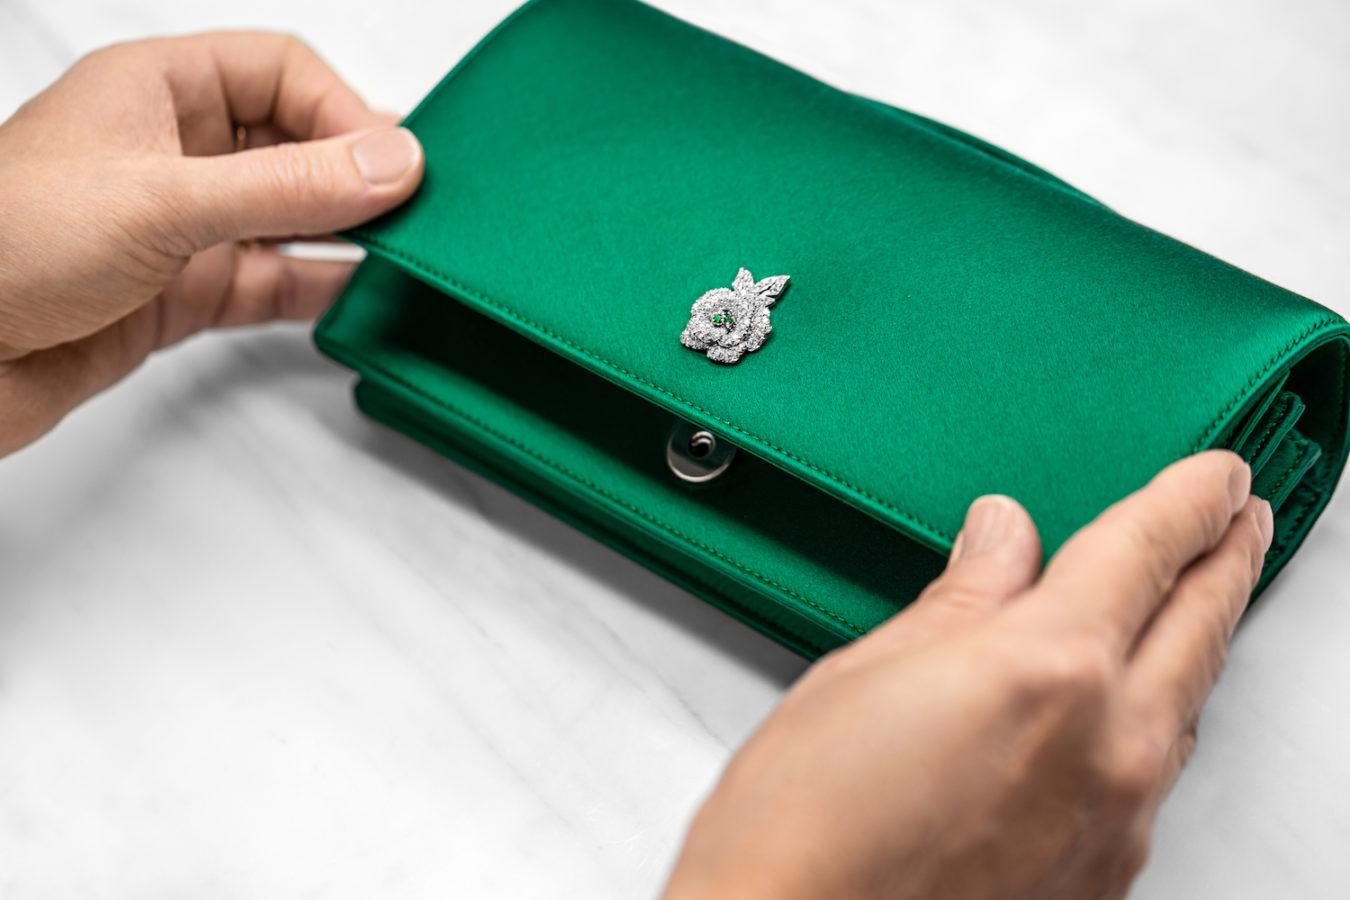 The Savoire-Faire Behind Dior's Opulent Diamond Rose Gem Clutch